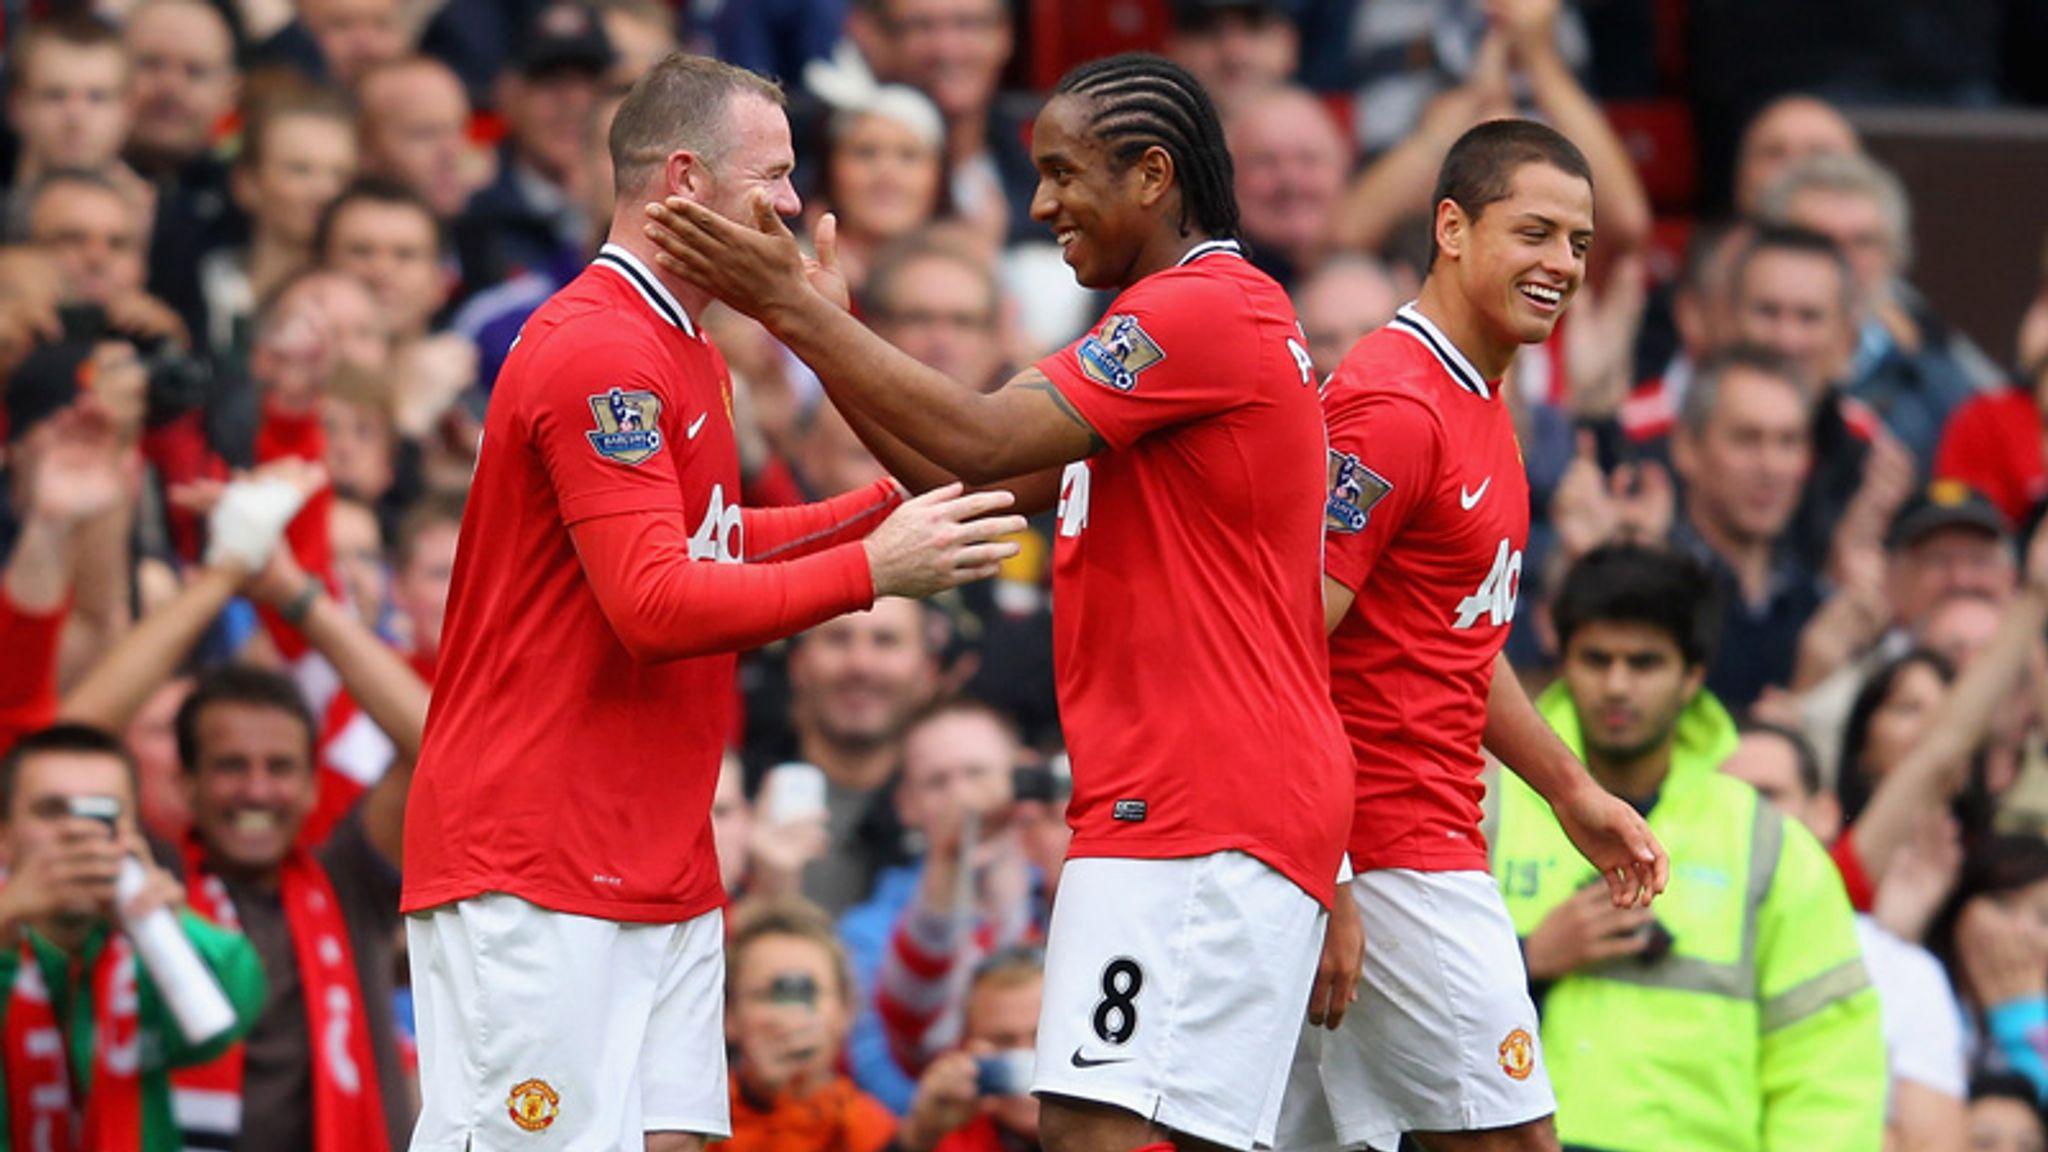 Man Utd 8 2 Arsenal Match Report Highlights